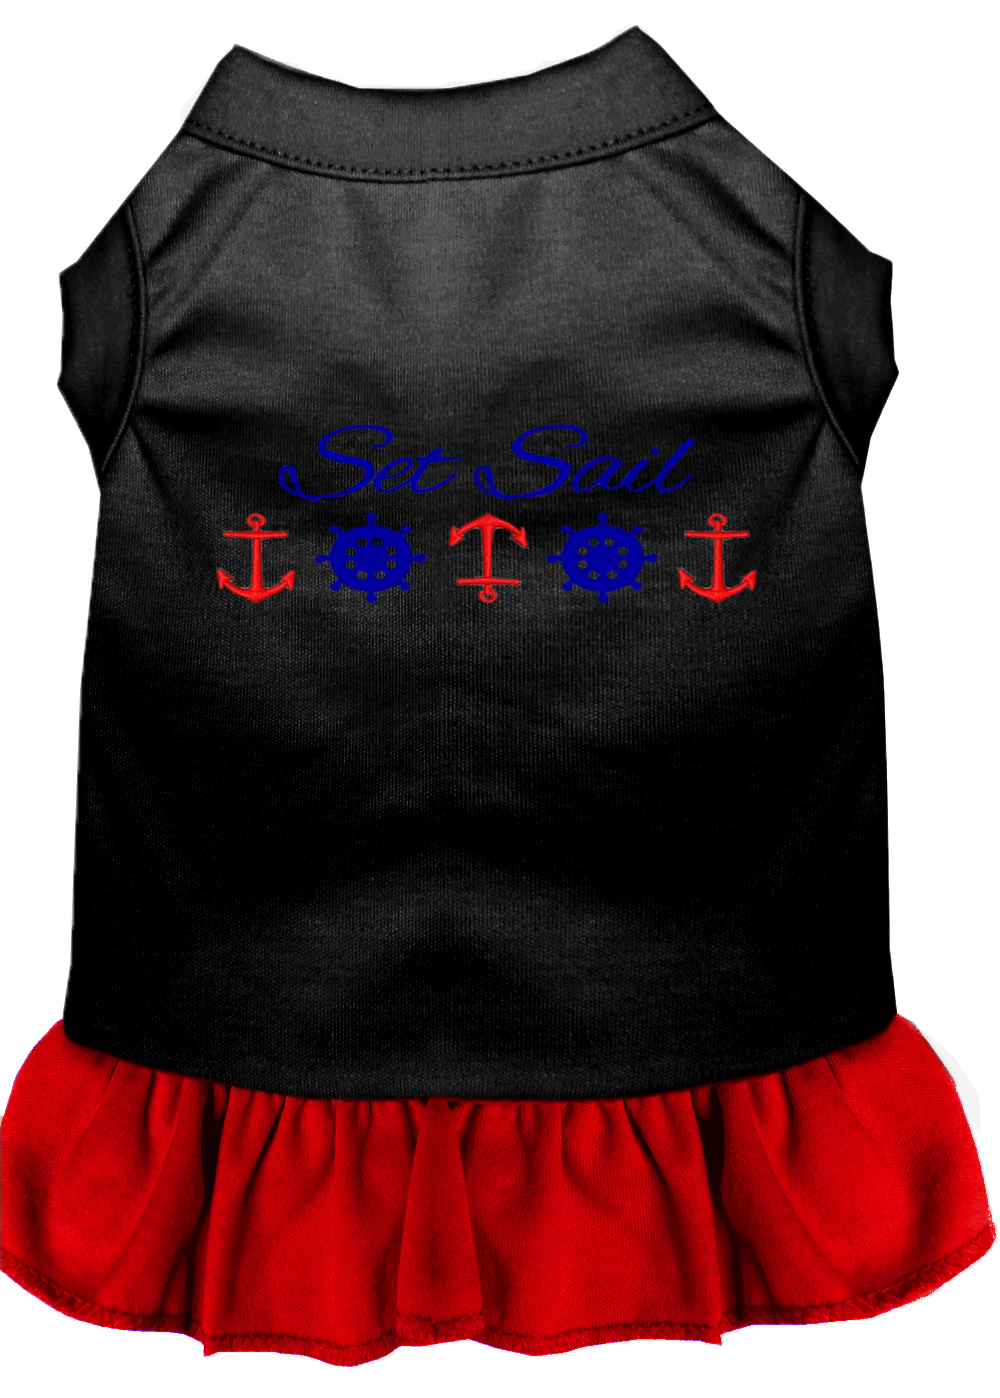 Set sail embroidered dog dress black with red xxl 18 for Xxl 18 xxl 2012 black